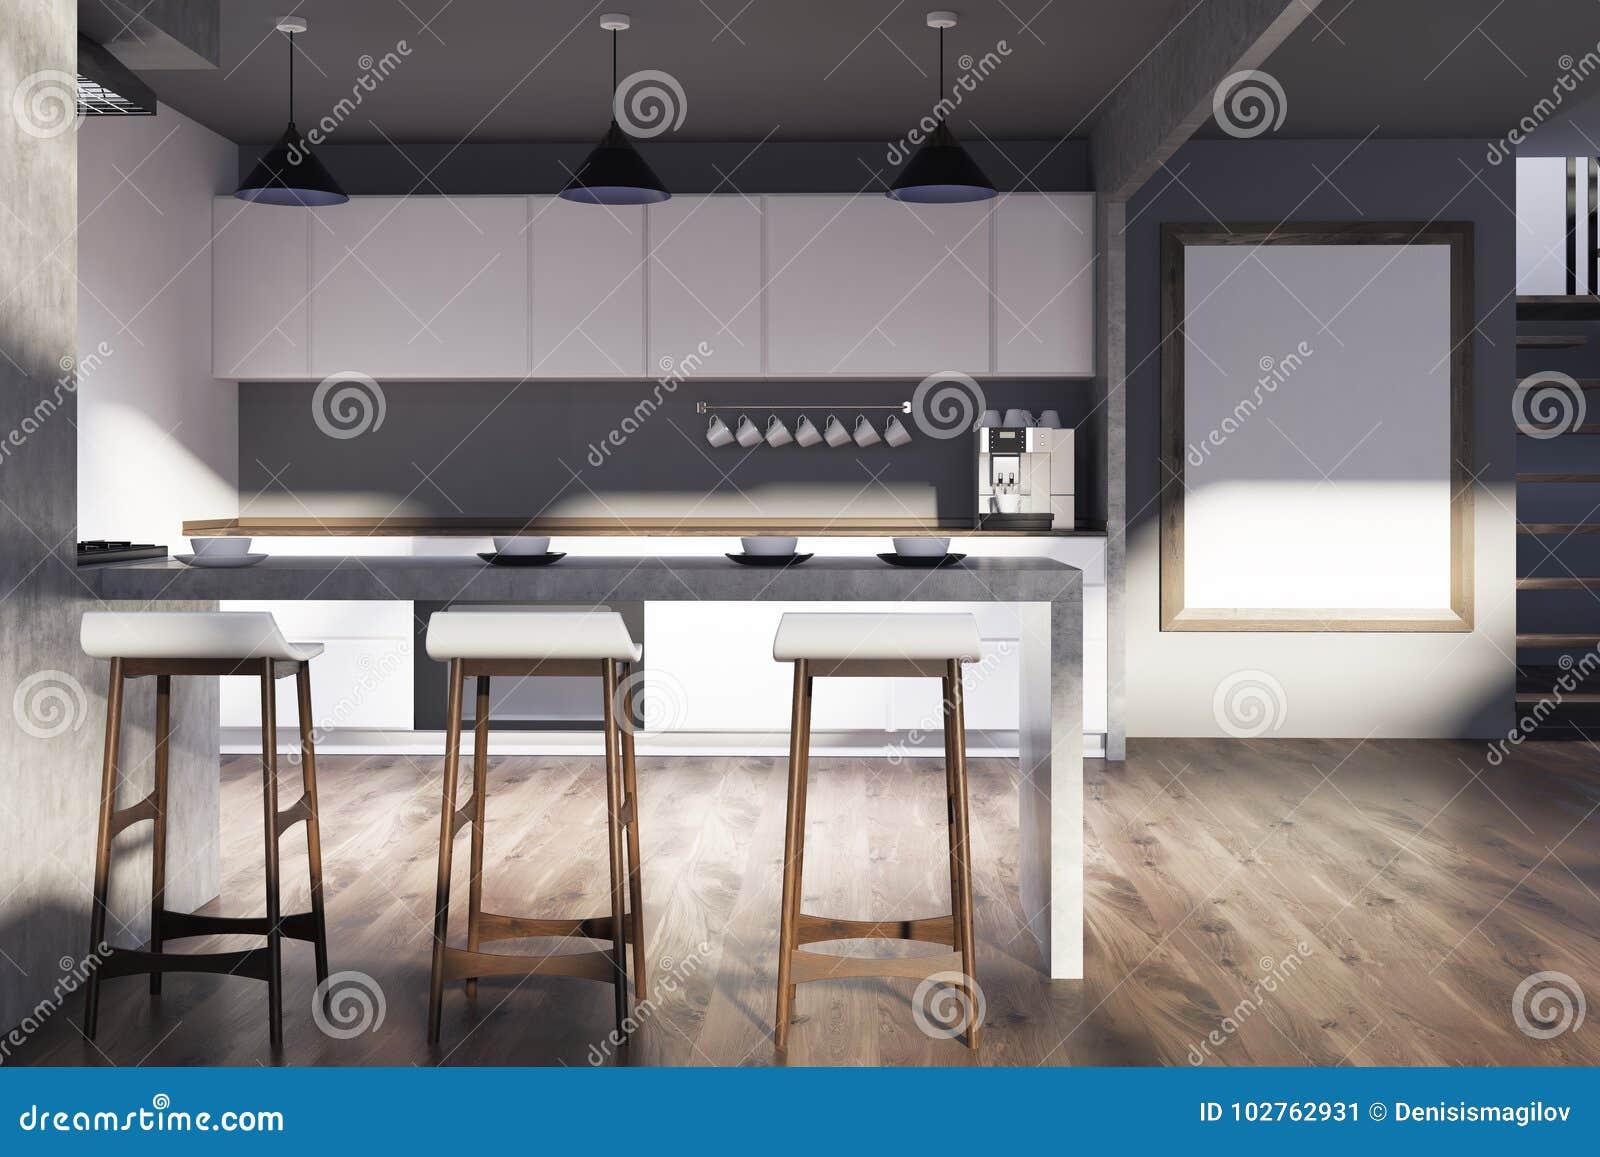 Grijze Houten Keuken : Grijze houten keuken bar affiche stock illustratie